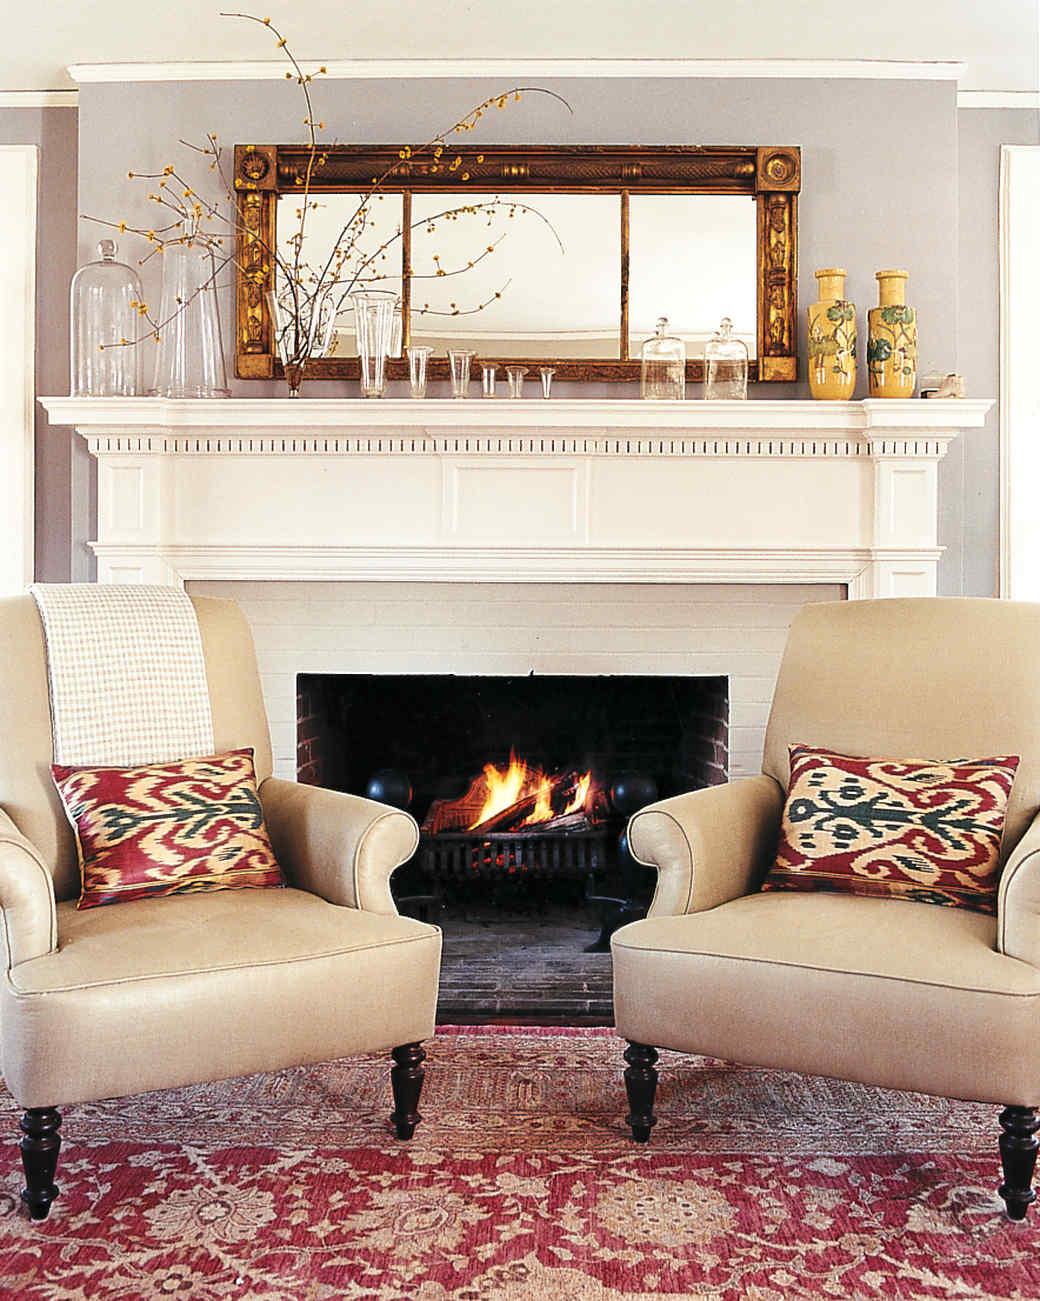 mla103122_0907_fireplace.jpg